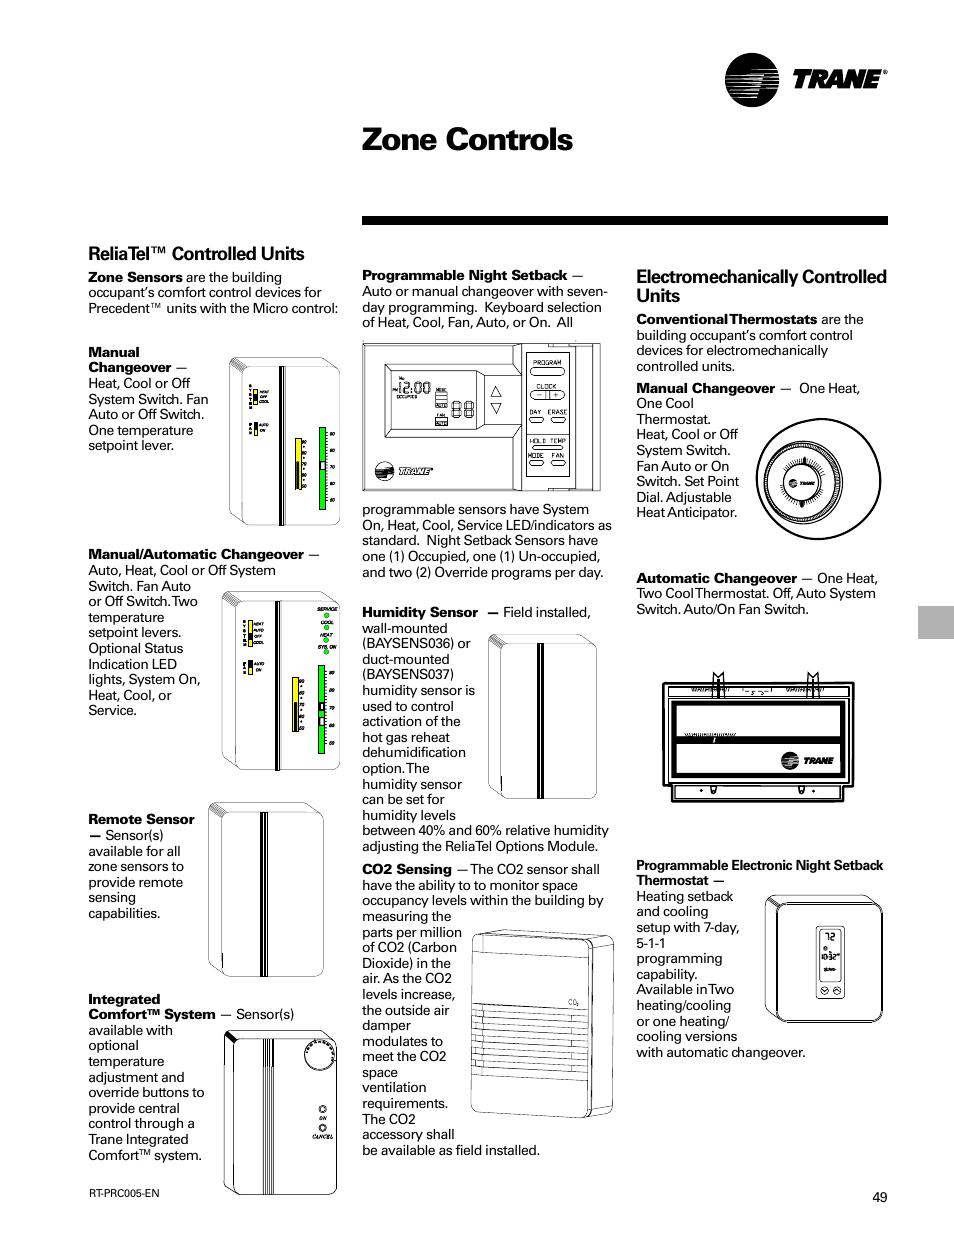 Zone controls, Controls, Reliatel™ controlled units